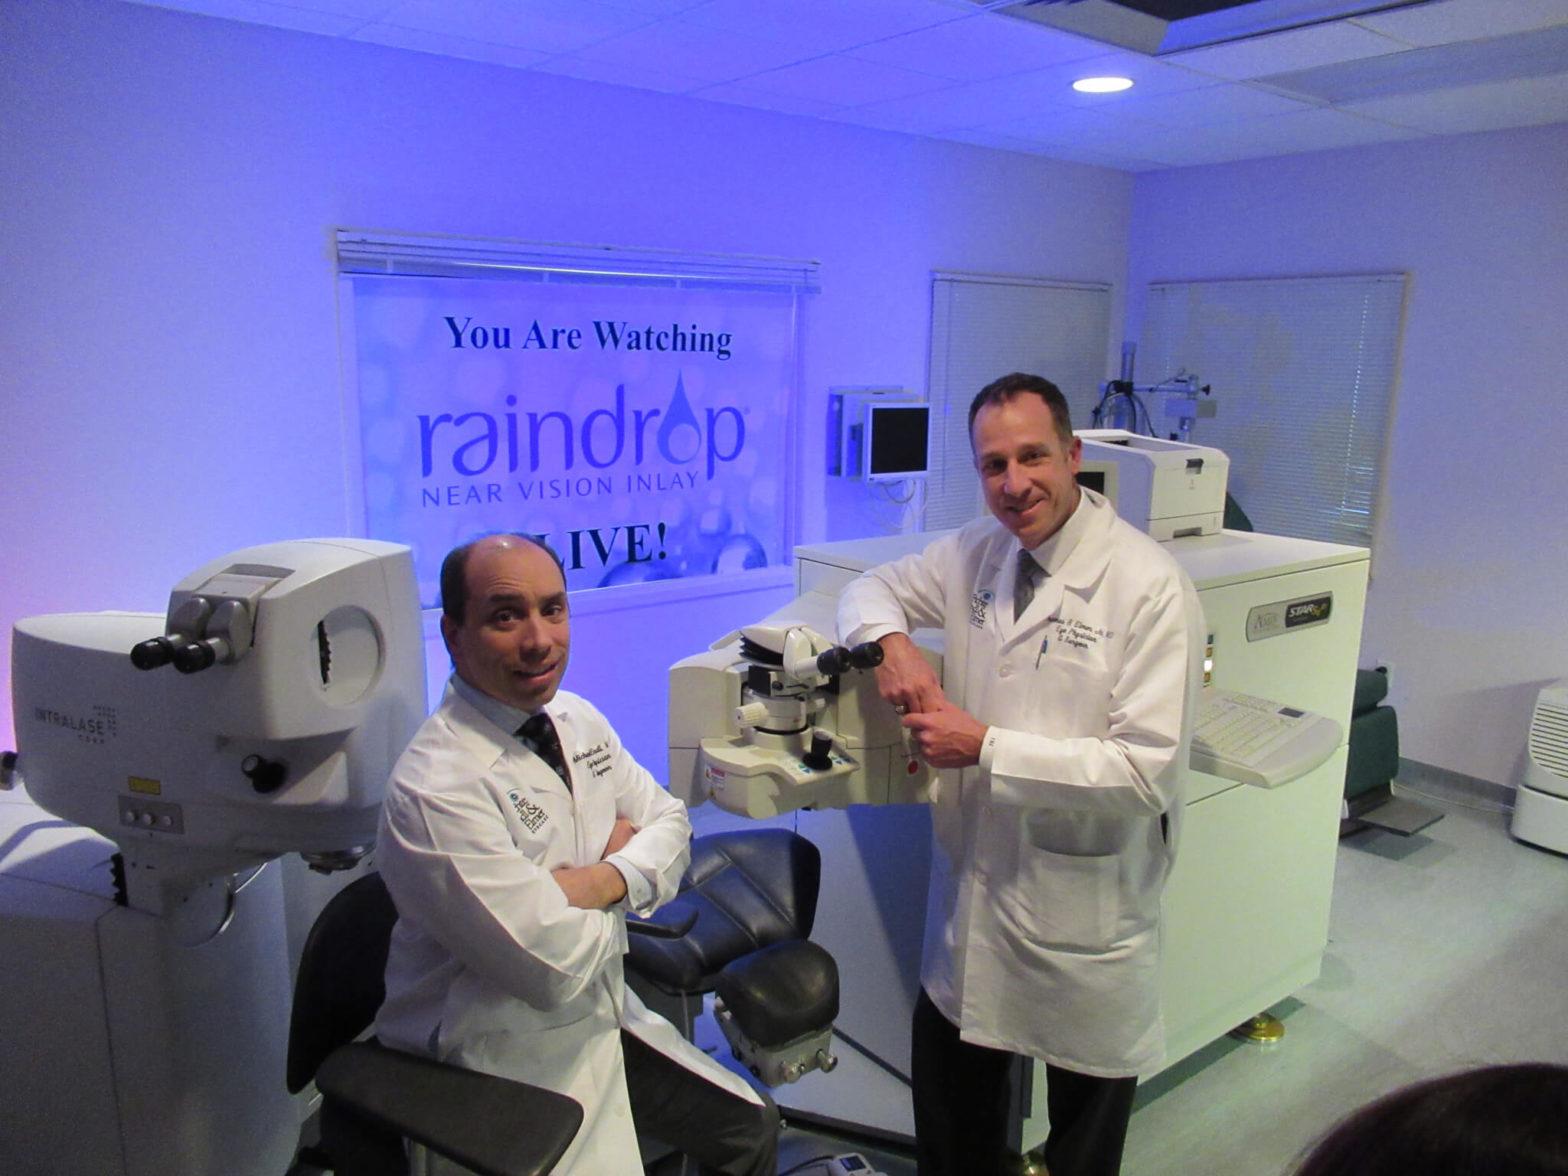 Dr. Endl and Elmer Raindrop Live